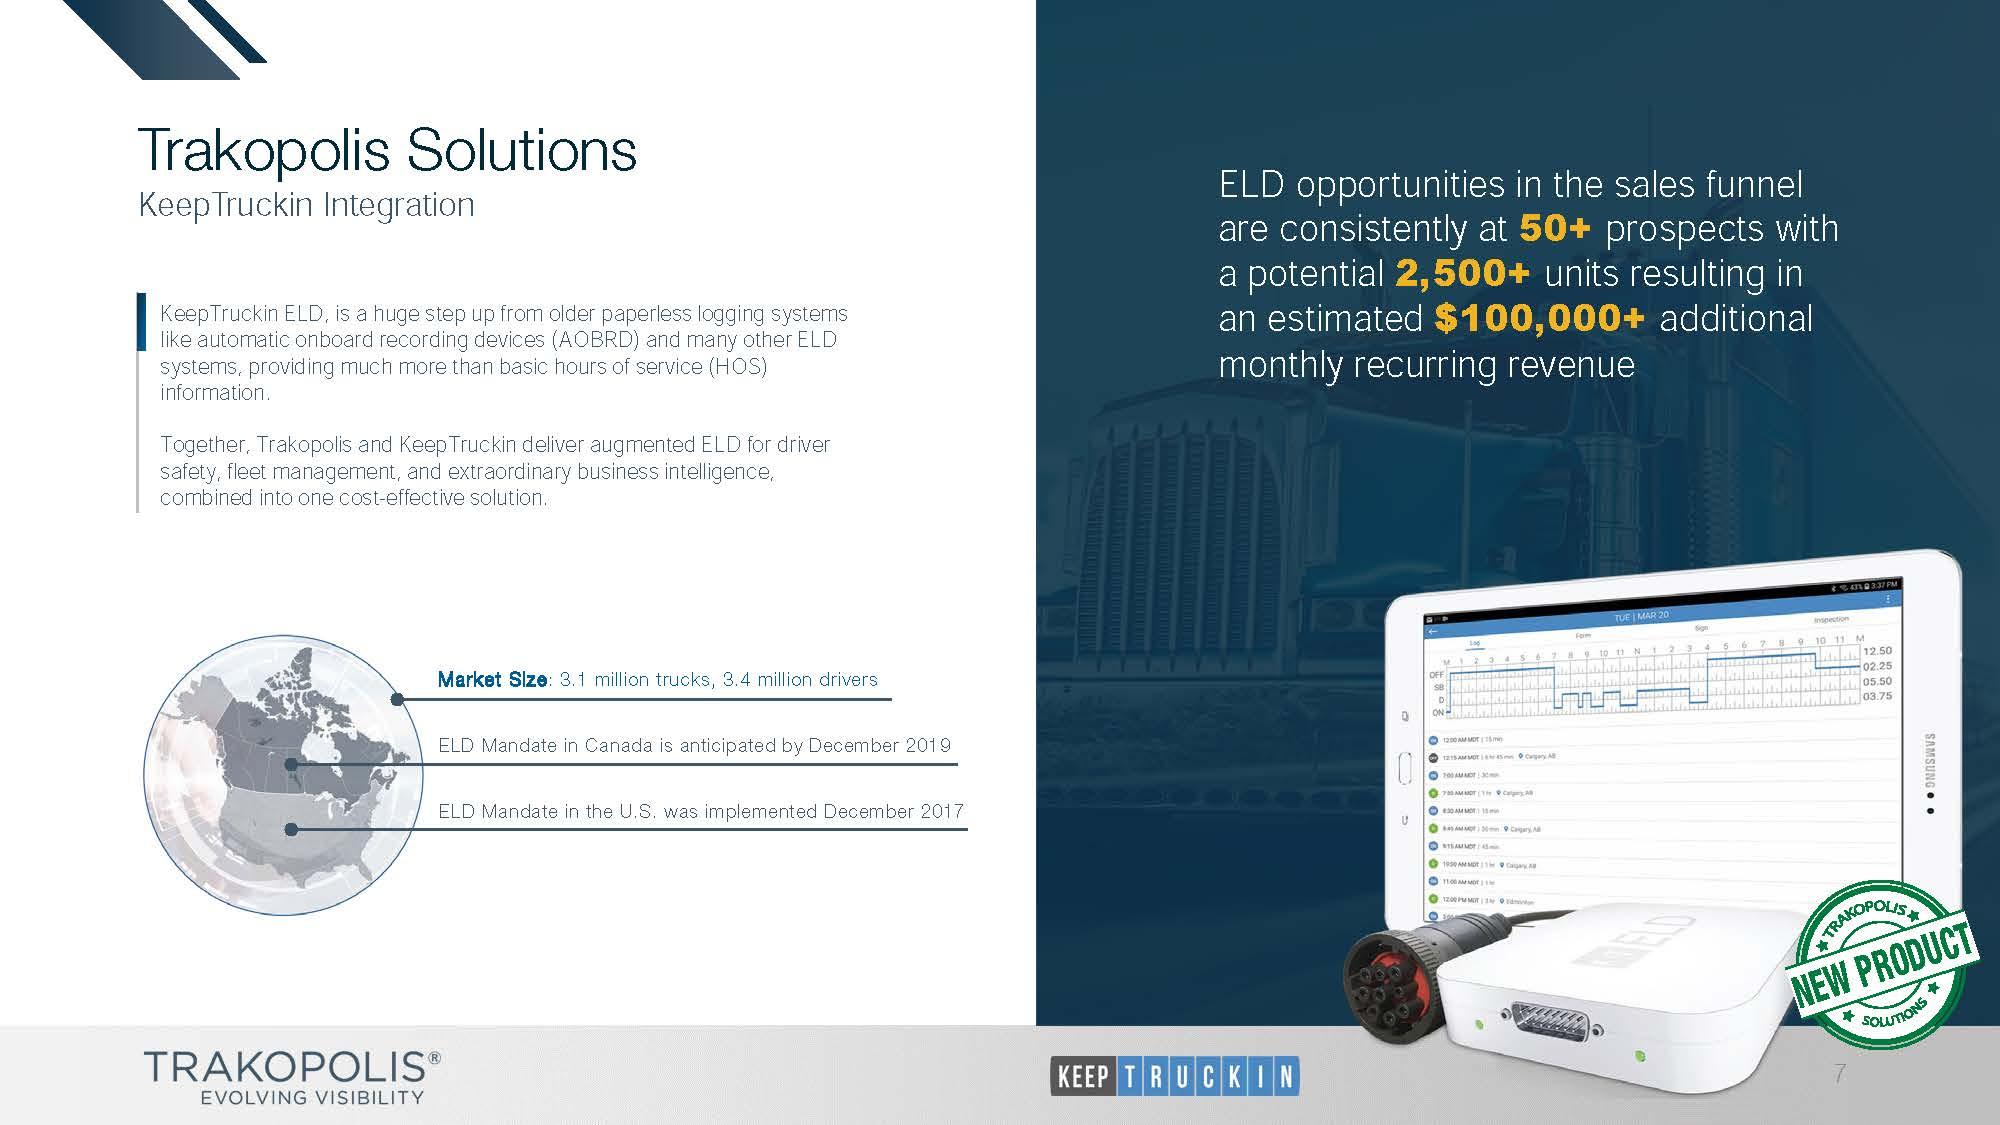 TRAK_CorporatePresentation_2019_Q1_web_Page_07.jpg